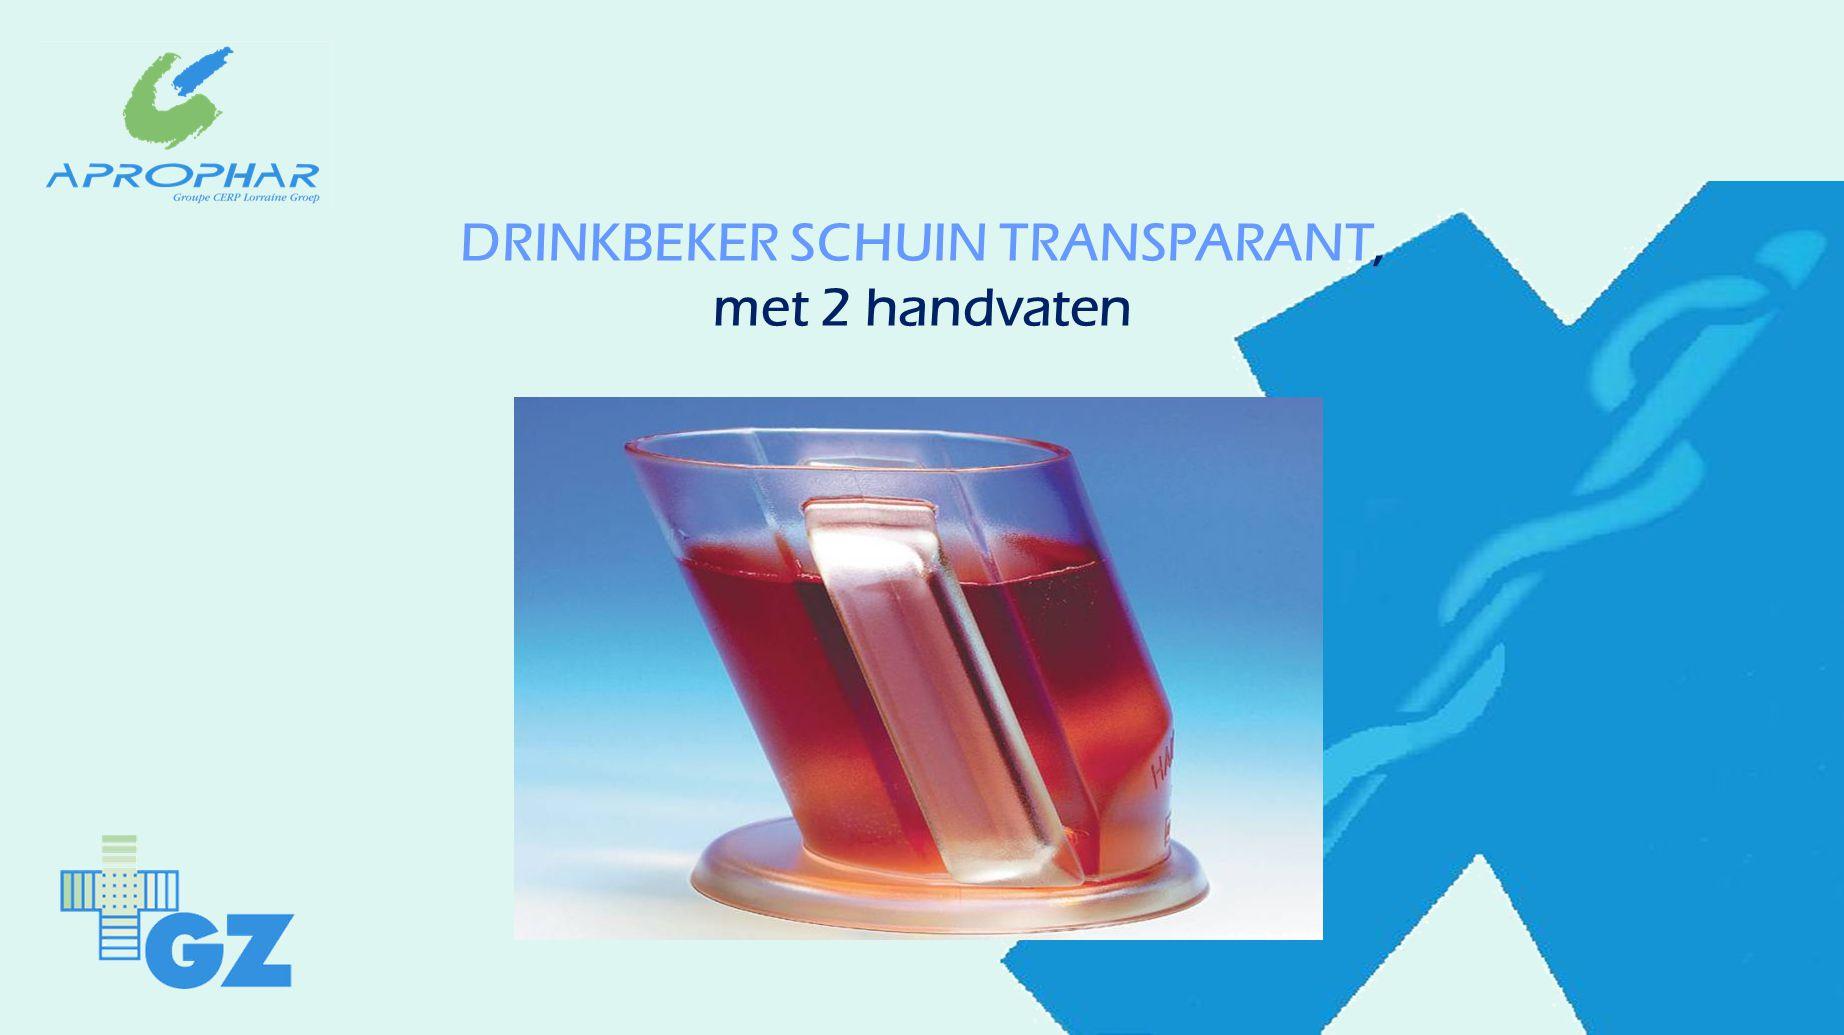 DRINKBEKER SCHUIN TRANSPARANT, met 2 handvaten